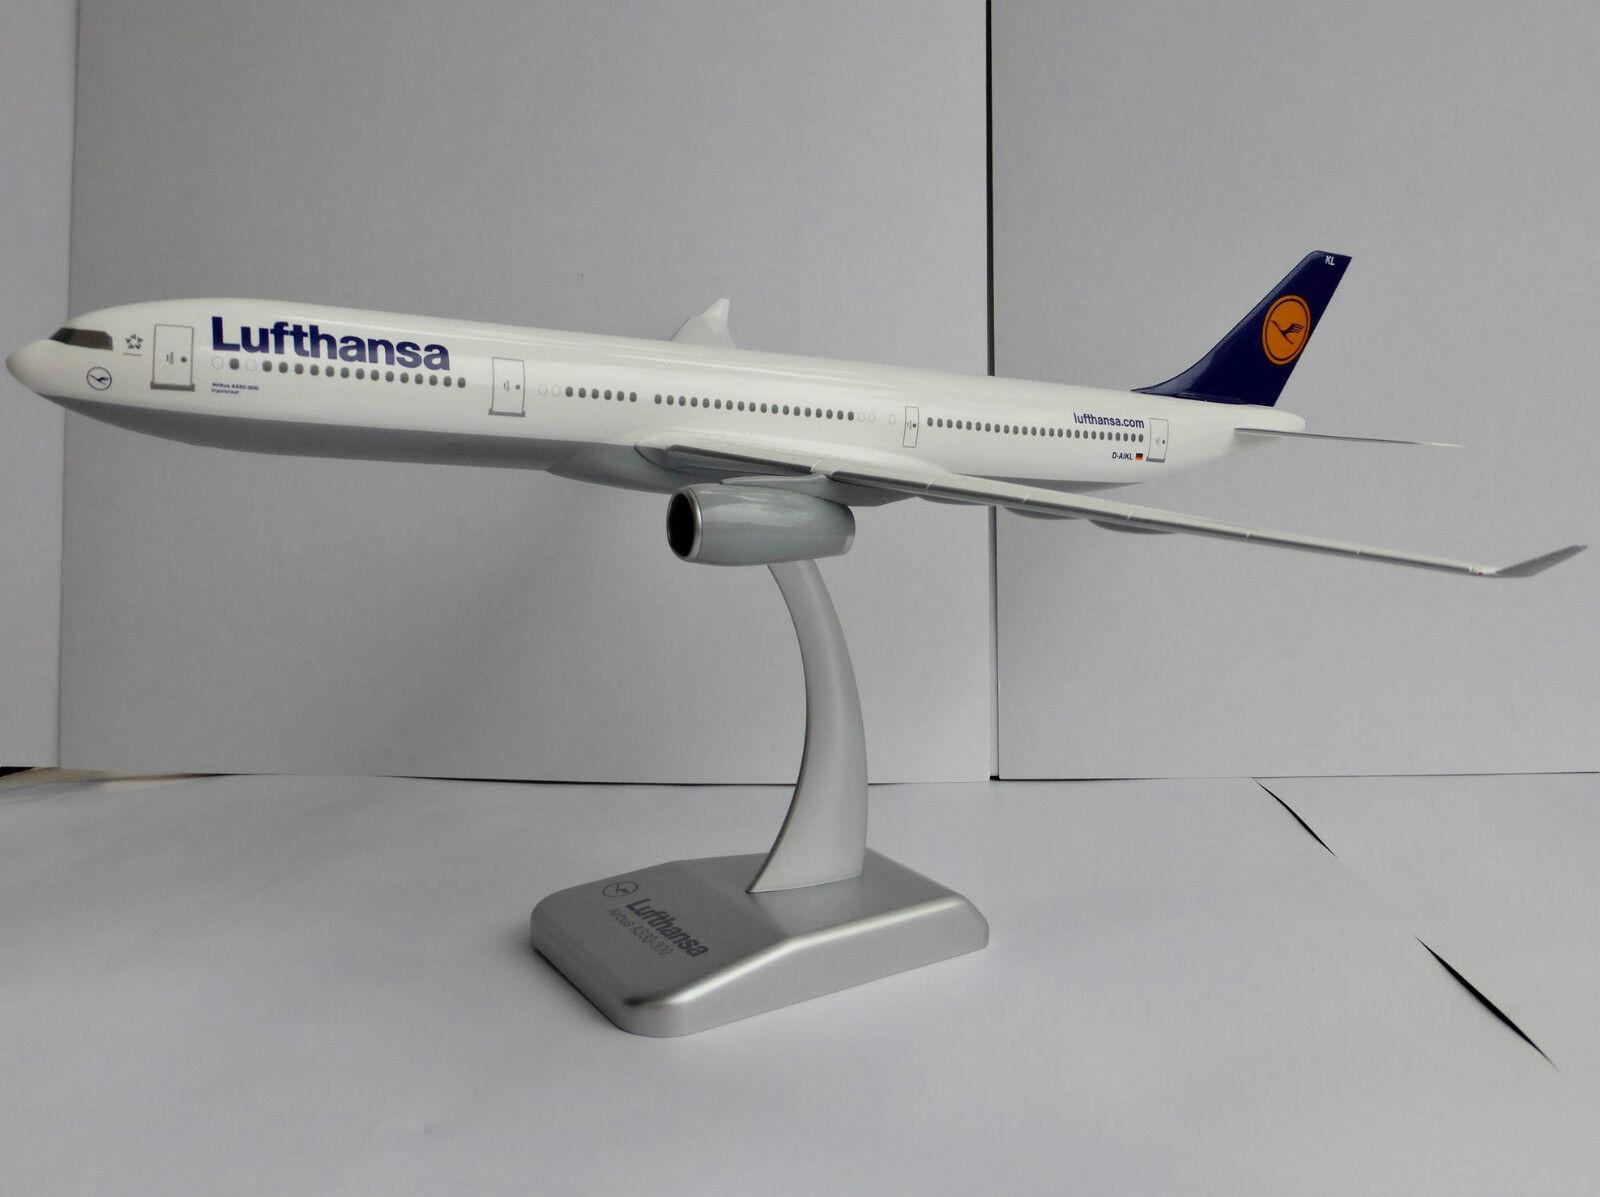 classico senza tempo Airautobus a330-300 Lufthansa 1 1 1 200 Limox Wings lh14 a330 a 330 LH D-aikl  consegna lampo